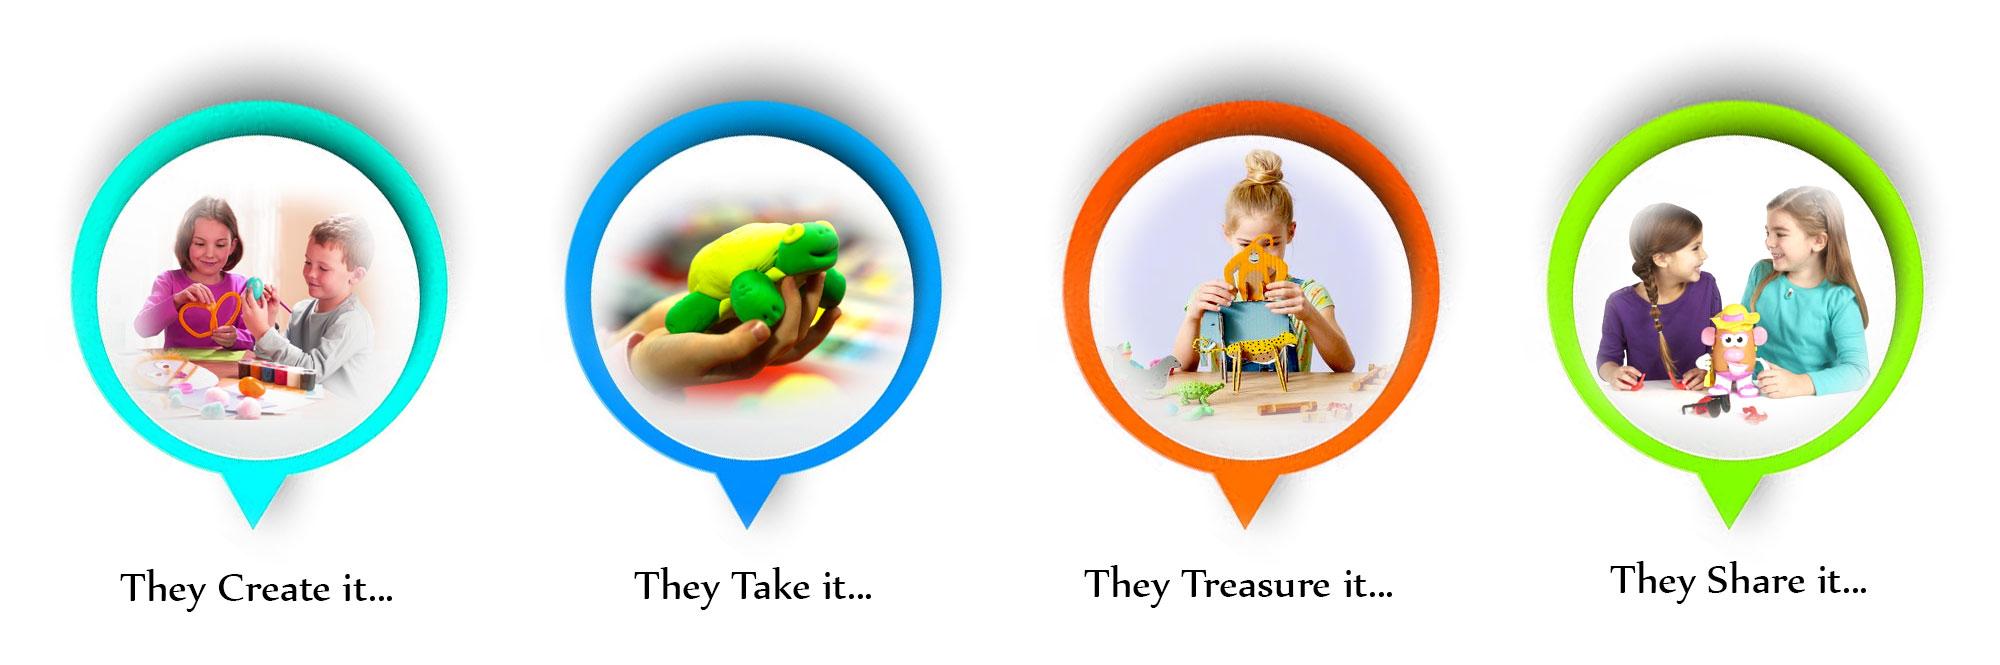 create,-make-,-take-,-share.jpg